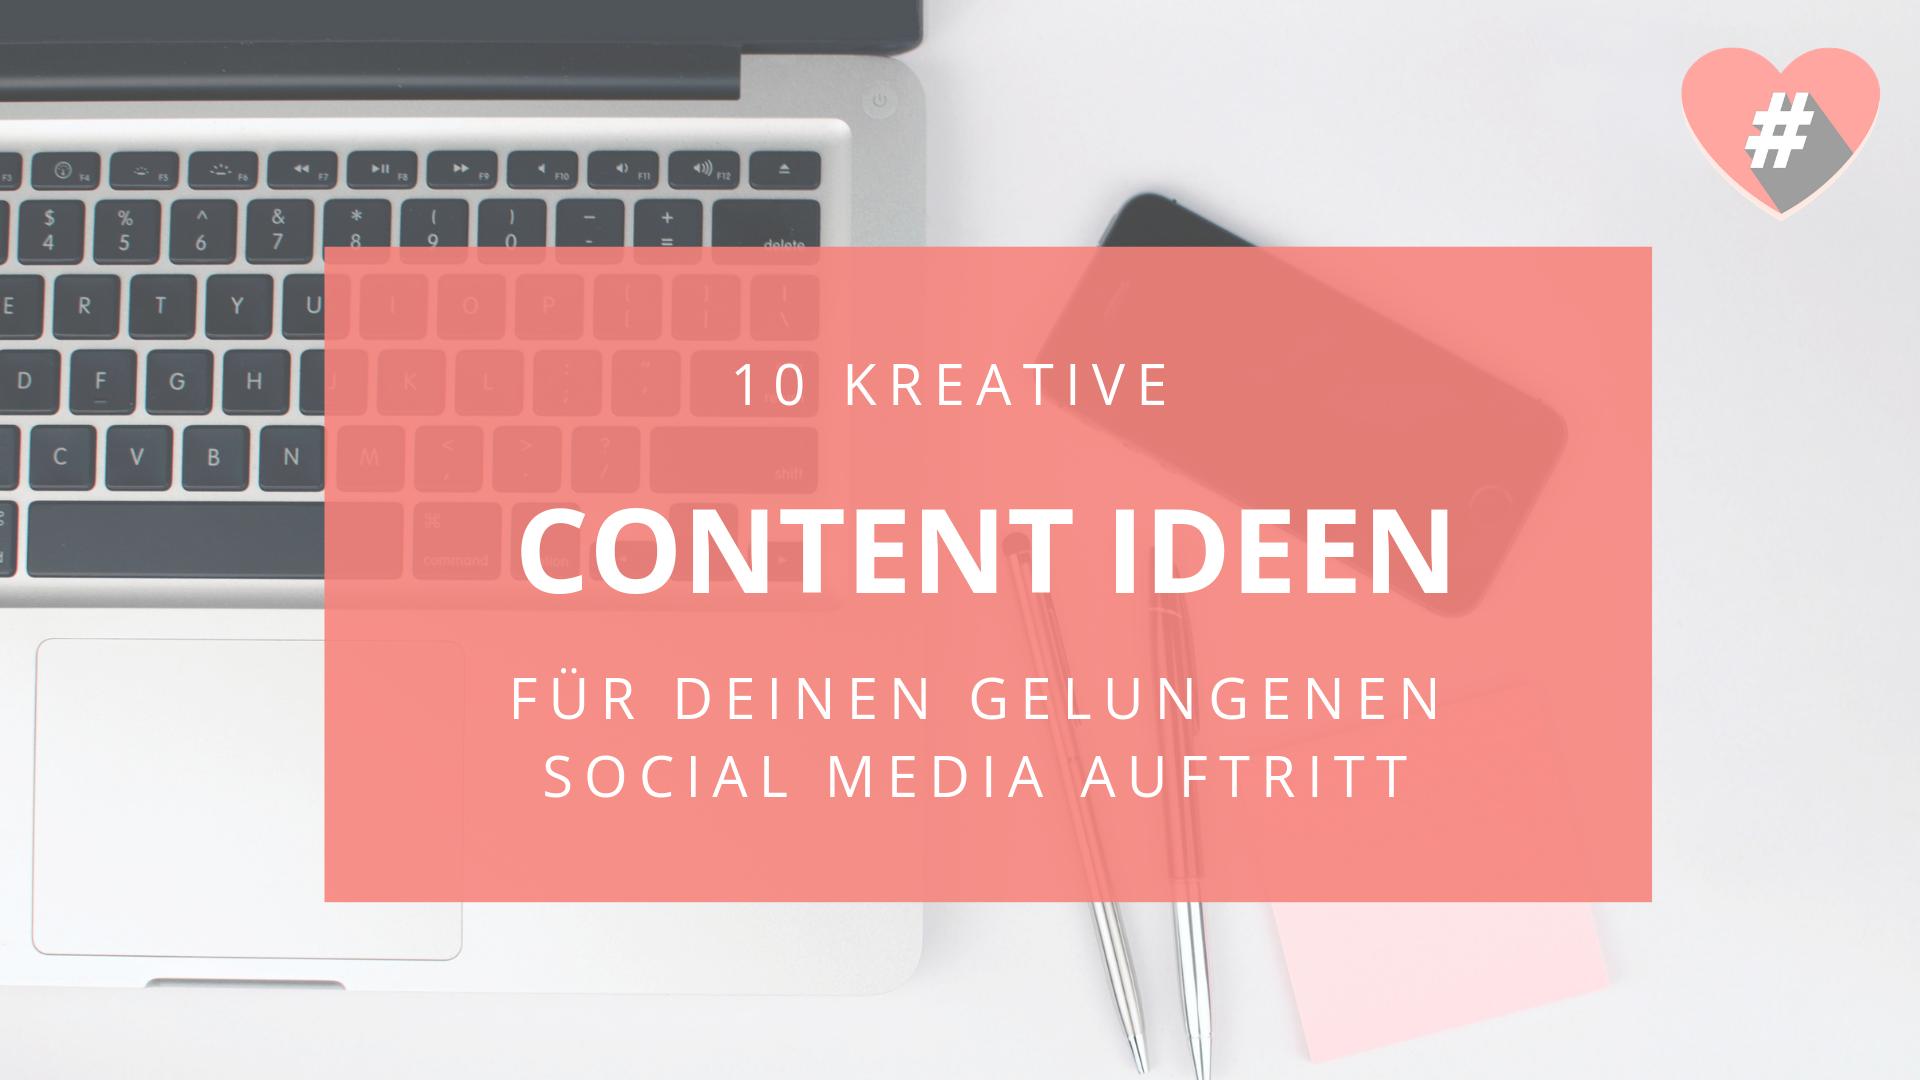 10 kreative Content Ideen für deinen gelungen Social Media Auftritt